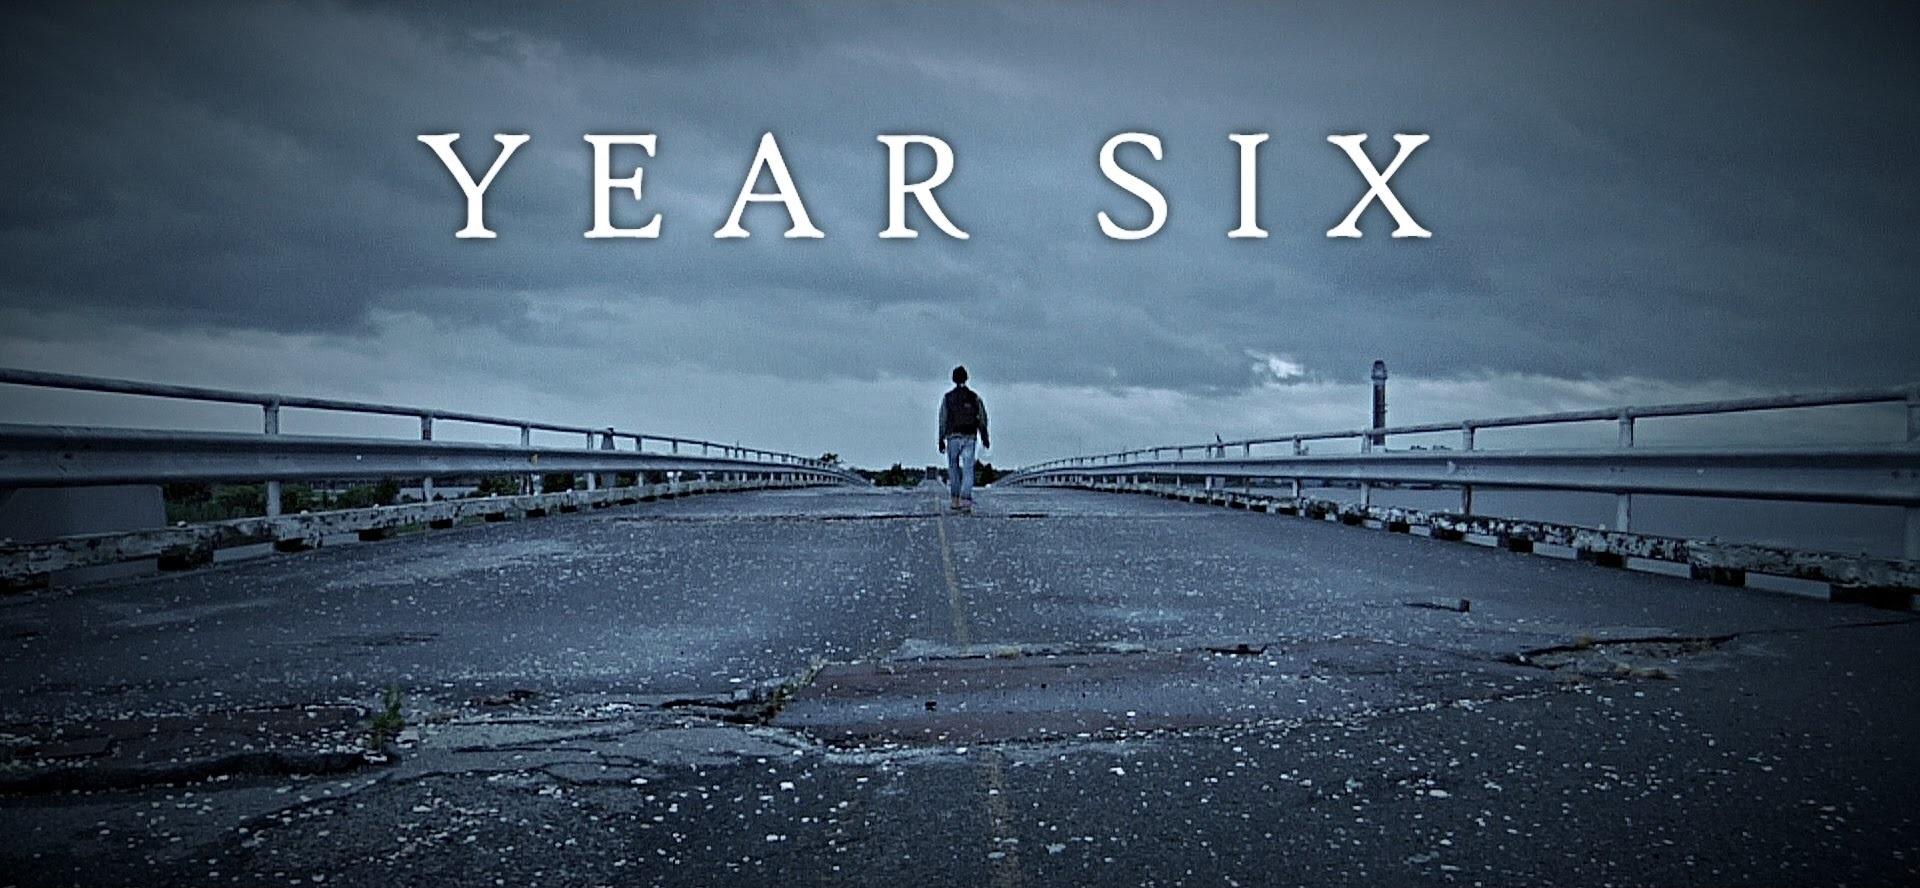 Year Six (2014)